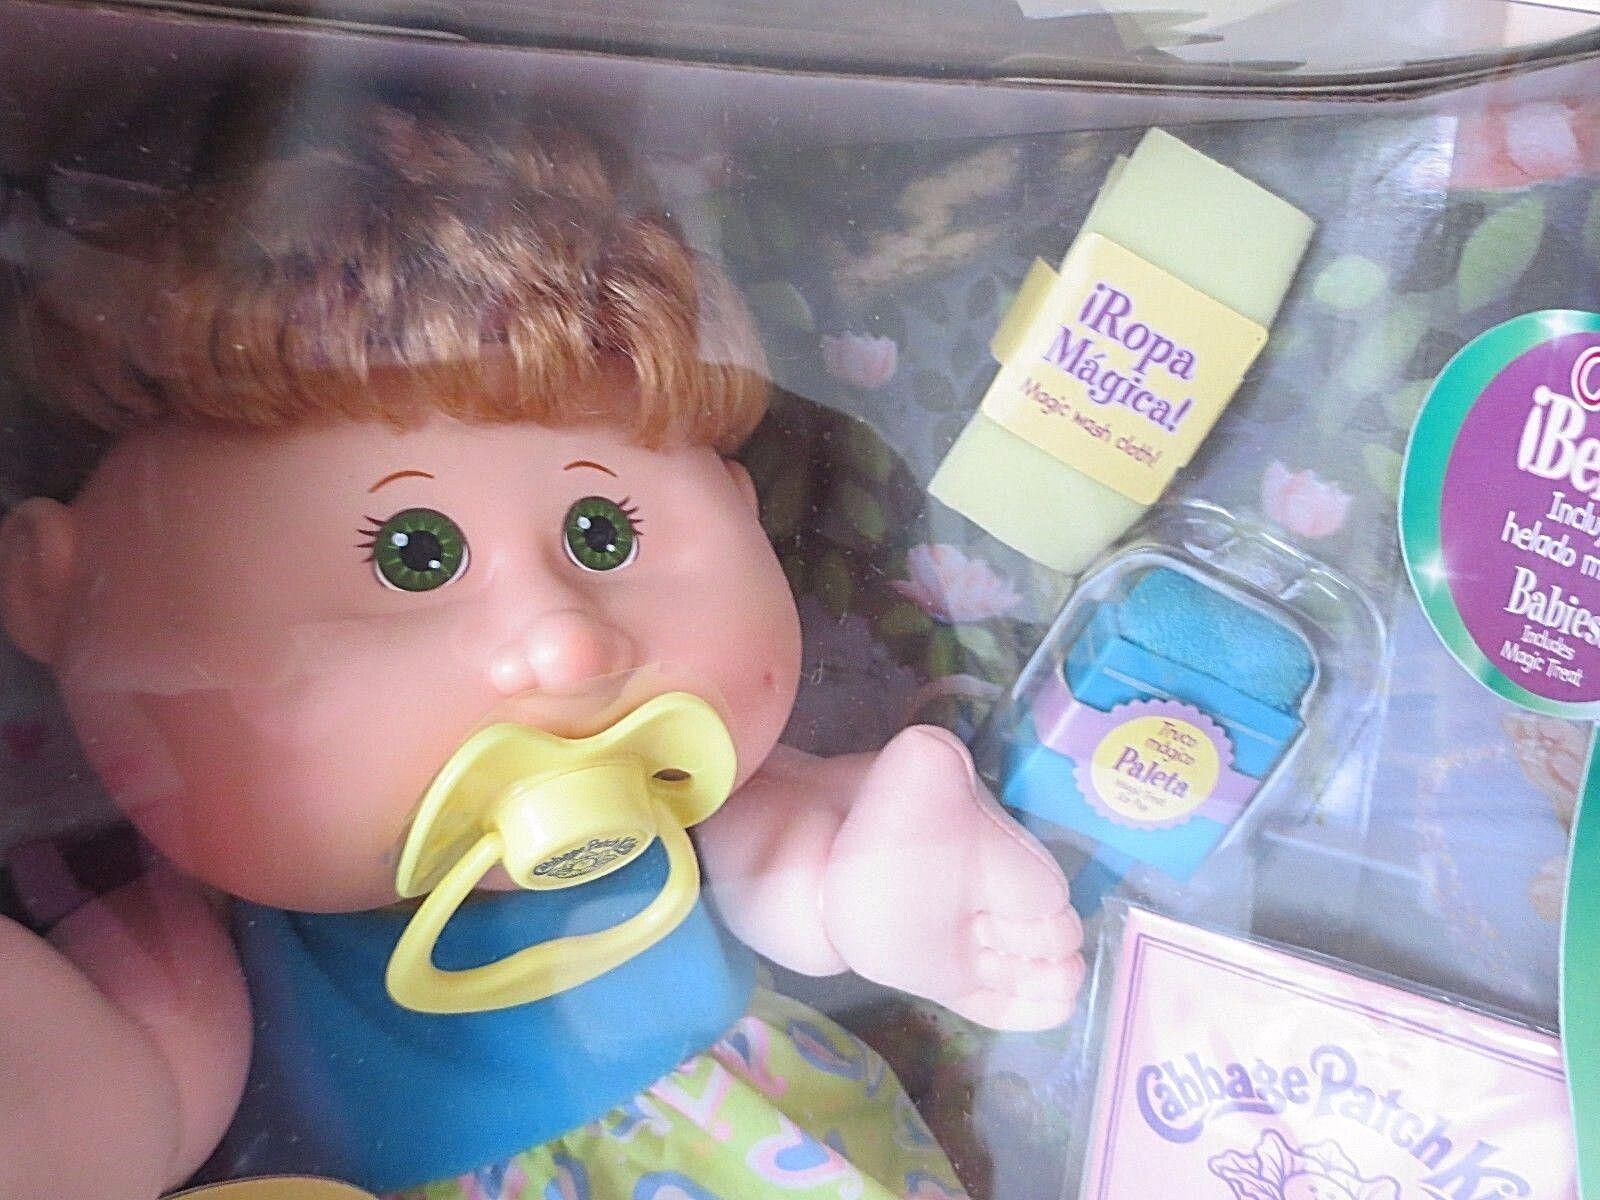 Cabbage Patch Kids bebés CHUPETE tratar Toalla nombre Nadia Trista Mar 20